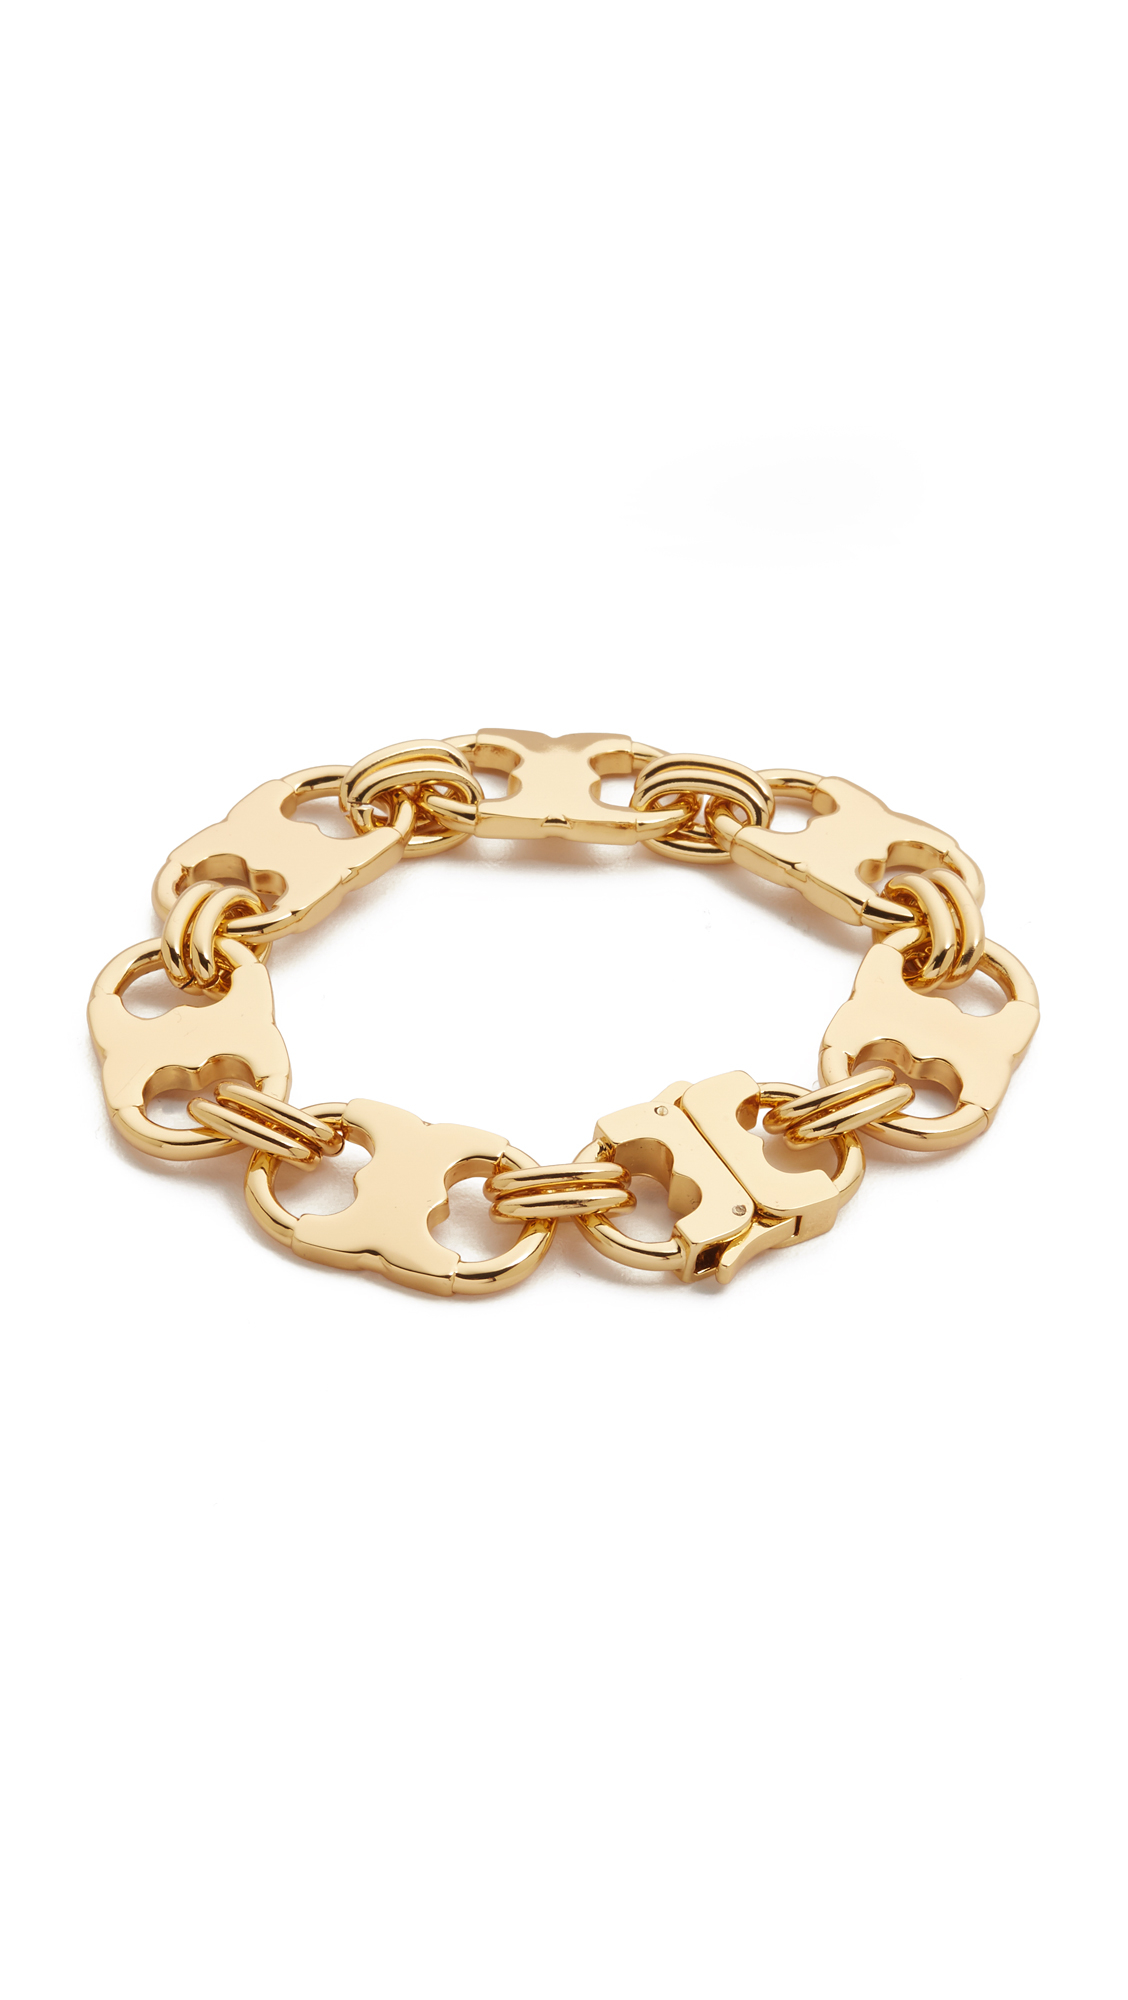 tory burch gemini link bracelet in metallic lyst. Black Bedroom Furniture Sets. Home Design Ideas